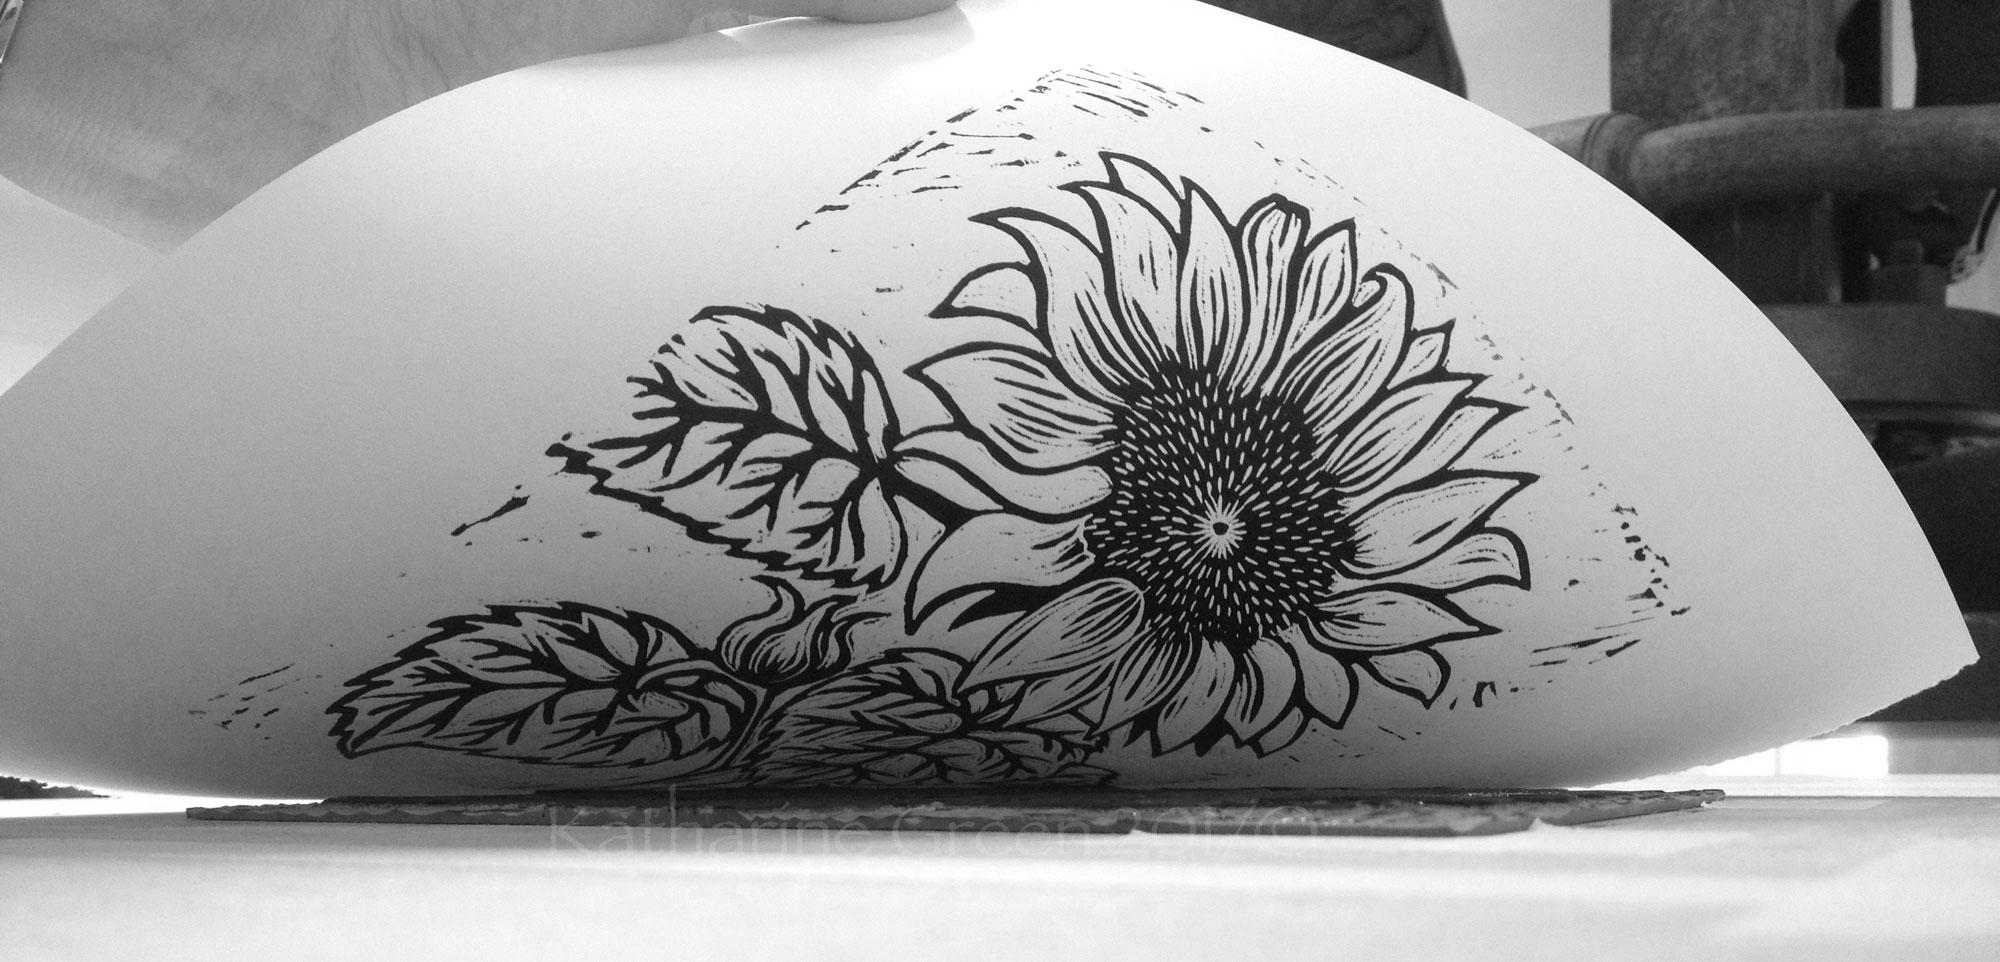 Sunflower-in-progress.jpg